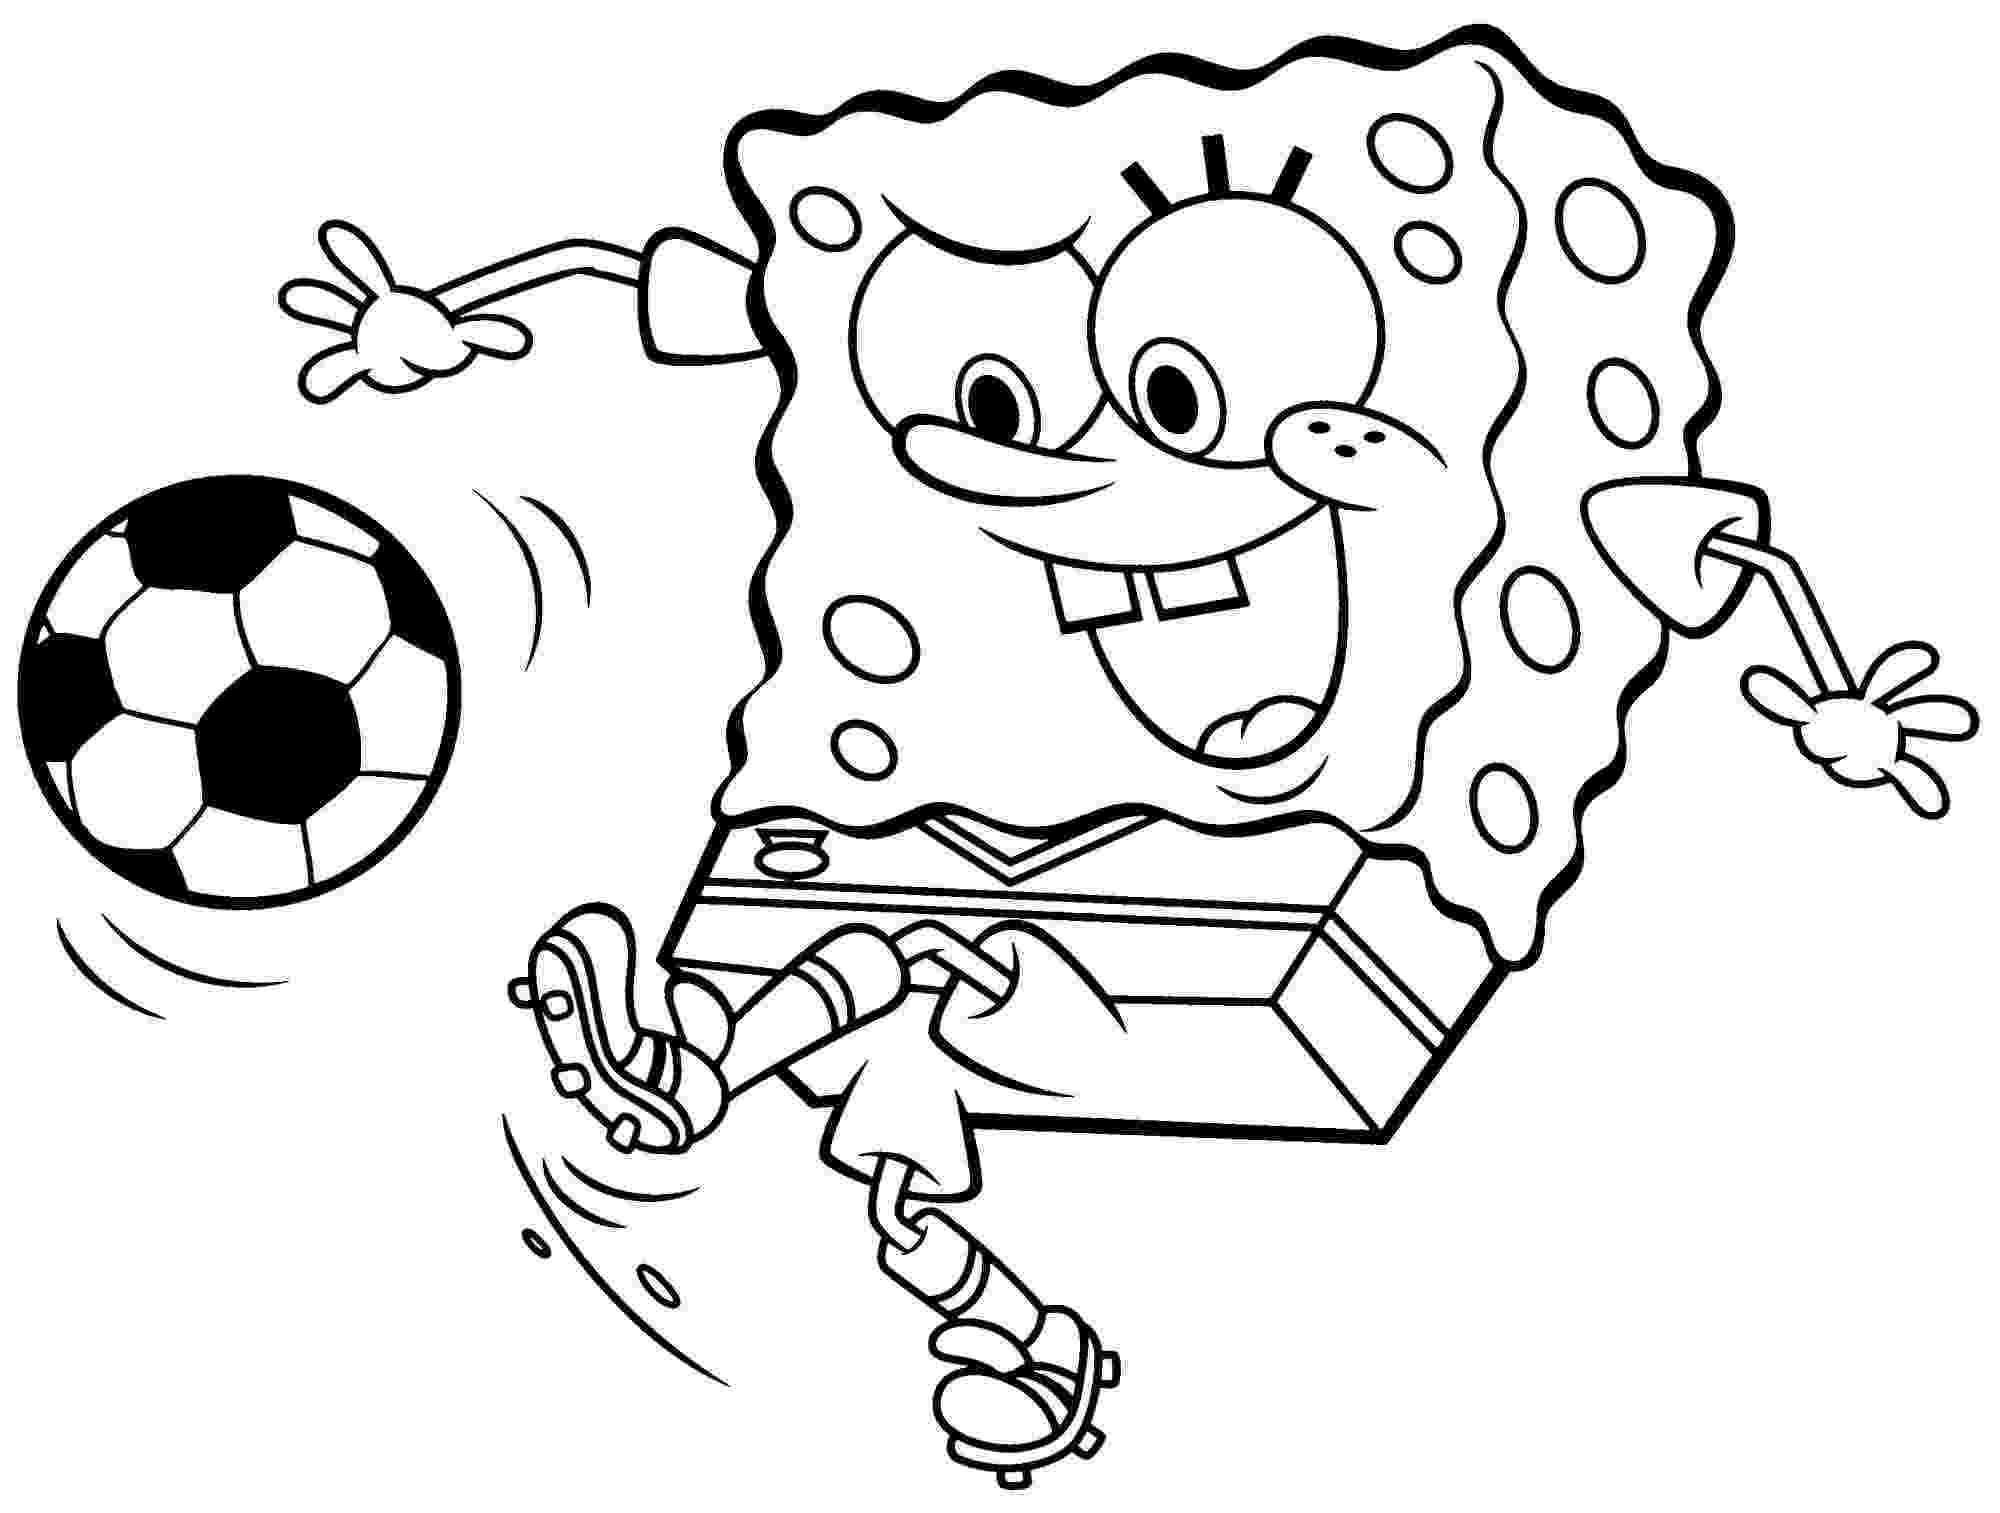 coloring sheets spongebob spongebob coloring page learn to coloring sheets spongebob coloring